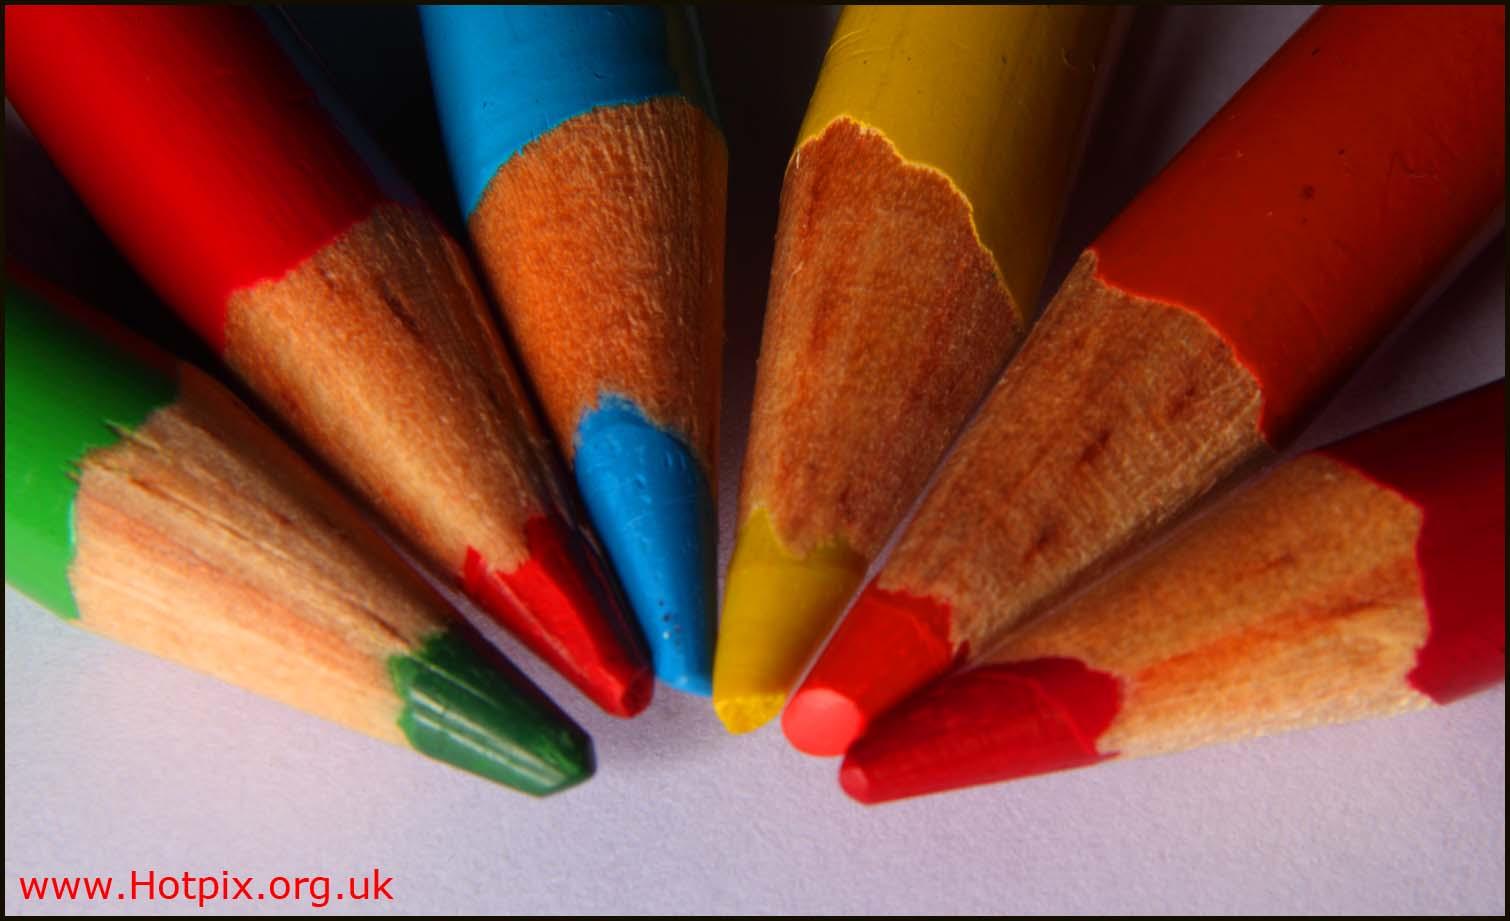 color,colored,coloured,colores,lapiz,pencils,green,red,blue,orange,yellow,paper,macro,extreme,close,up,closeup,tubes,bellows,still,life,stillife,stilllife,wood,wooden,cumberland,museum,cumbria,england,uk,unlimited photos,hotpix!